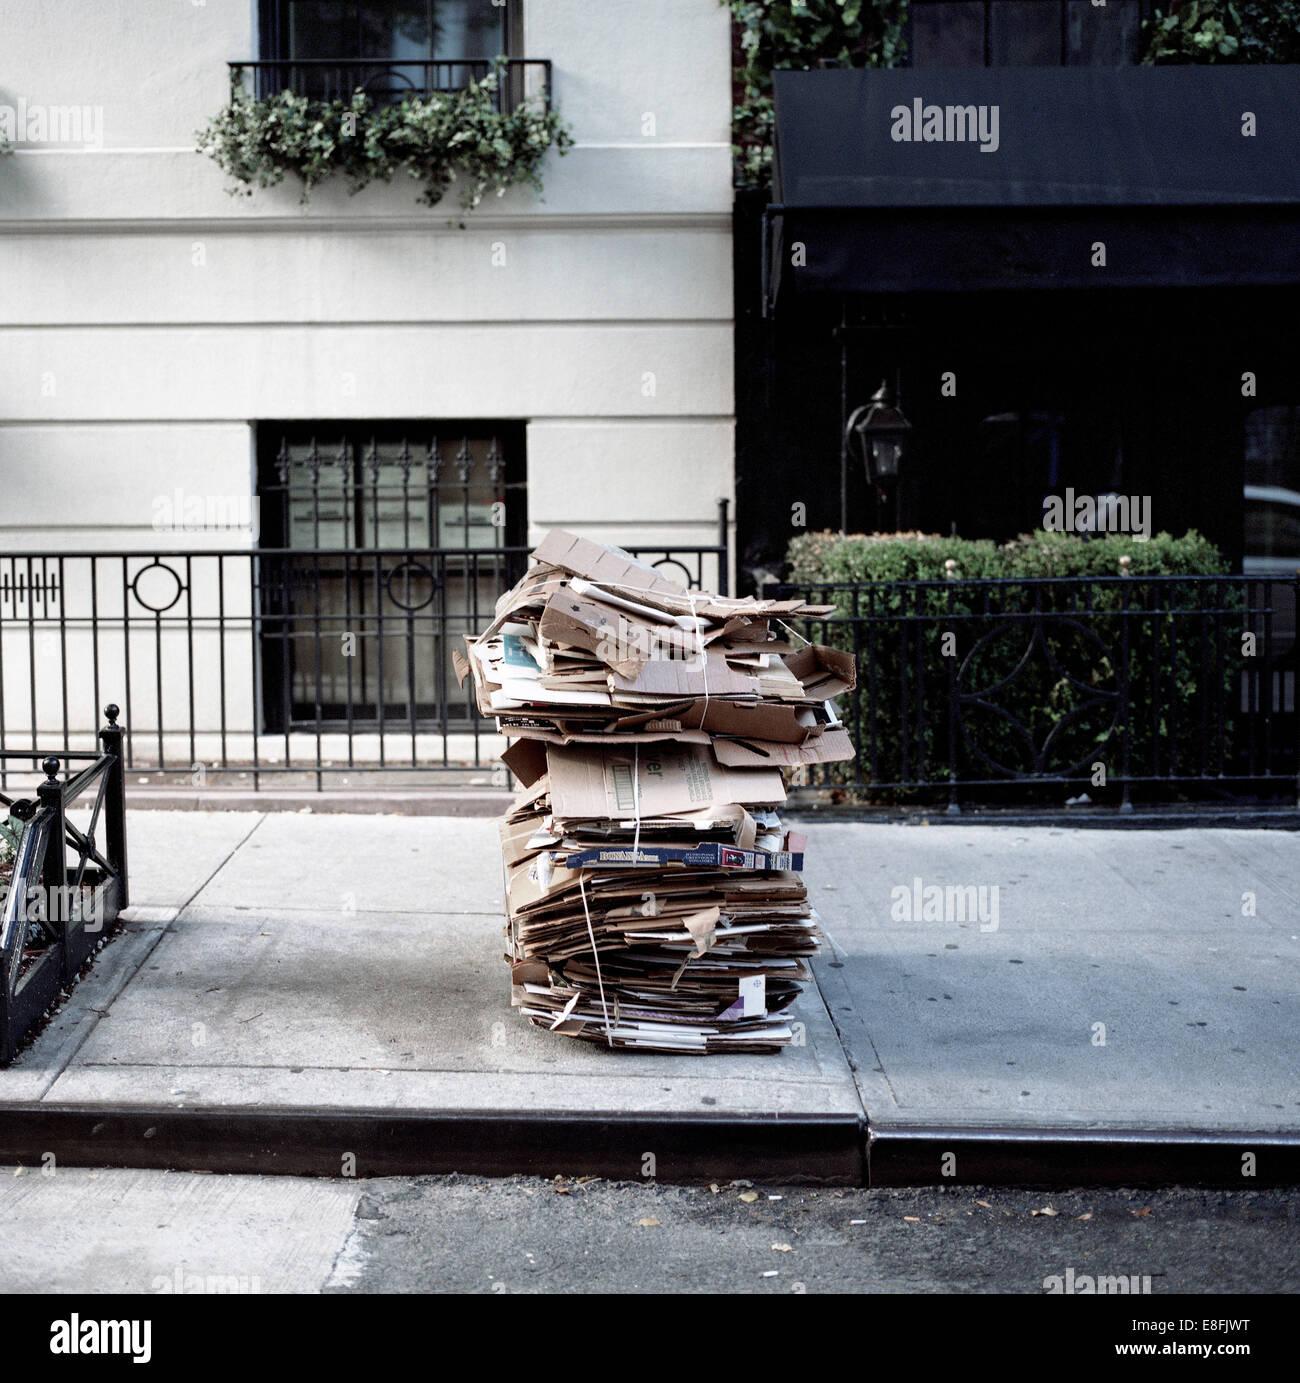 Kartons auf Straße für das recycling, New York, Amerika, USA Stockbild